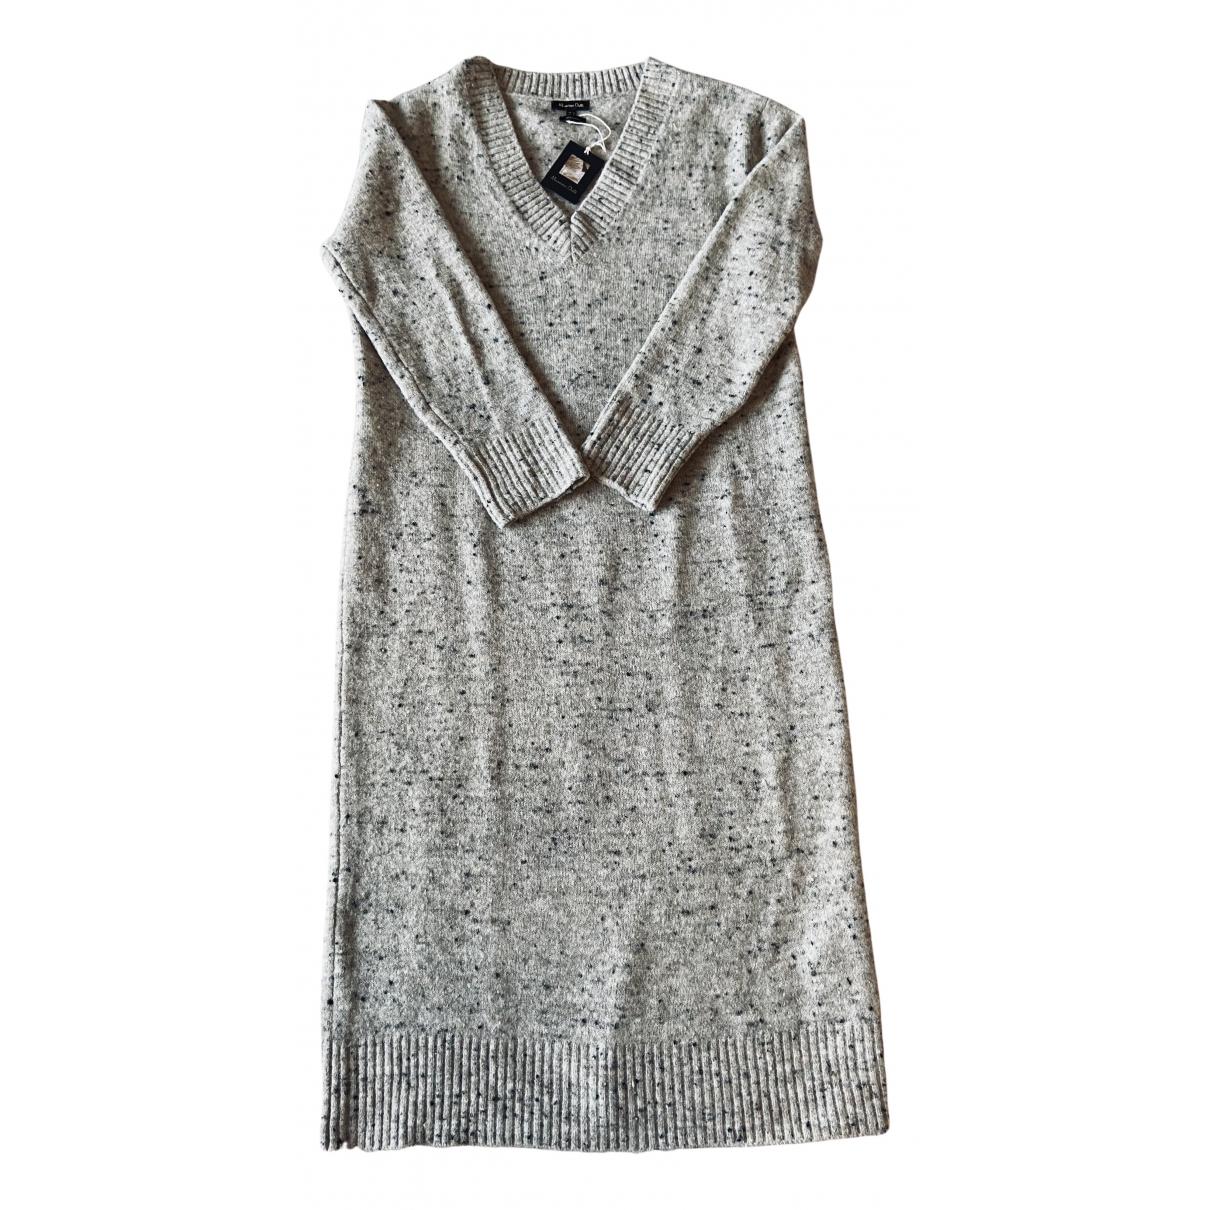 Massimo Dutti N Ecru Wool Knitwear for Women S International